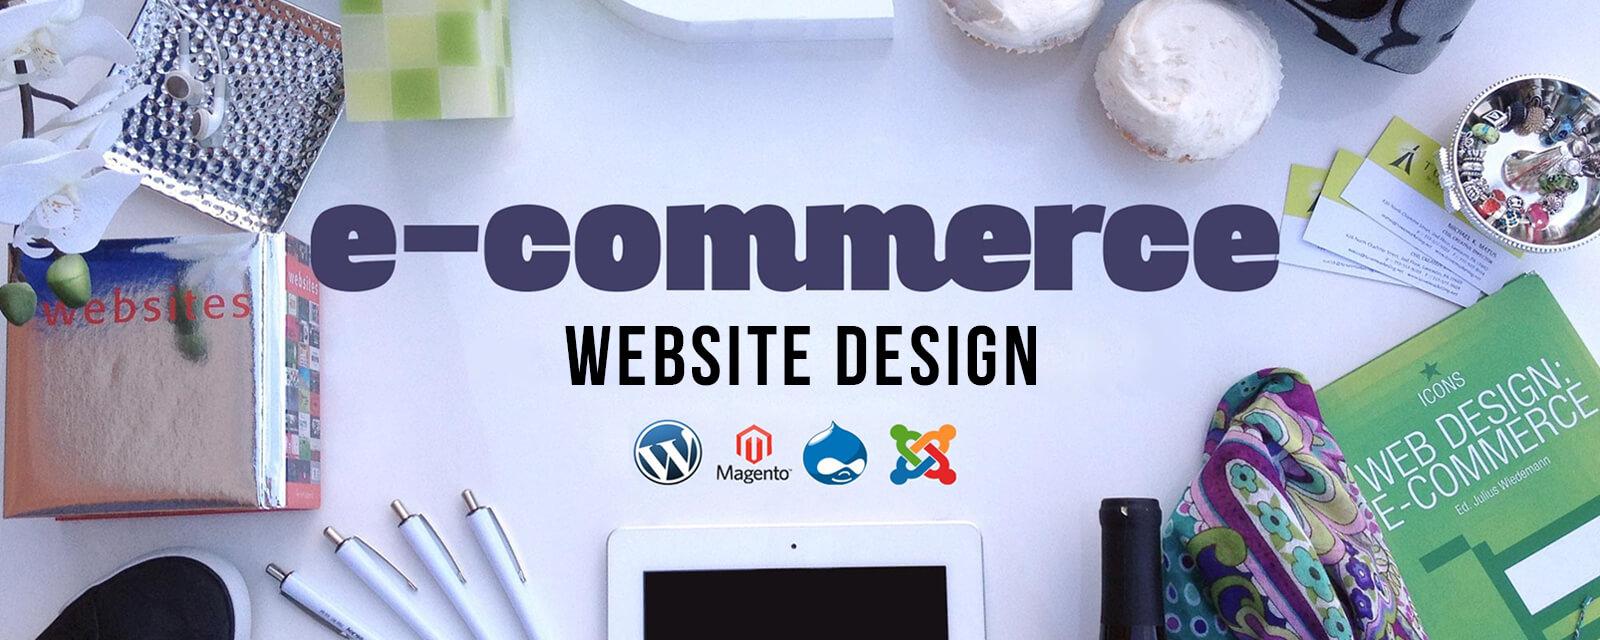 WooCommerce blog banner